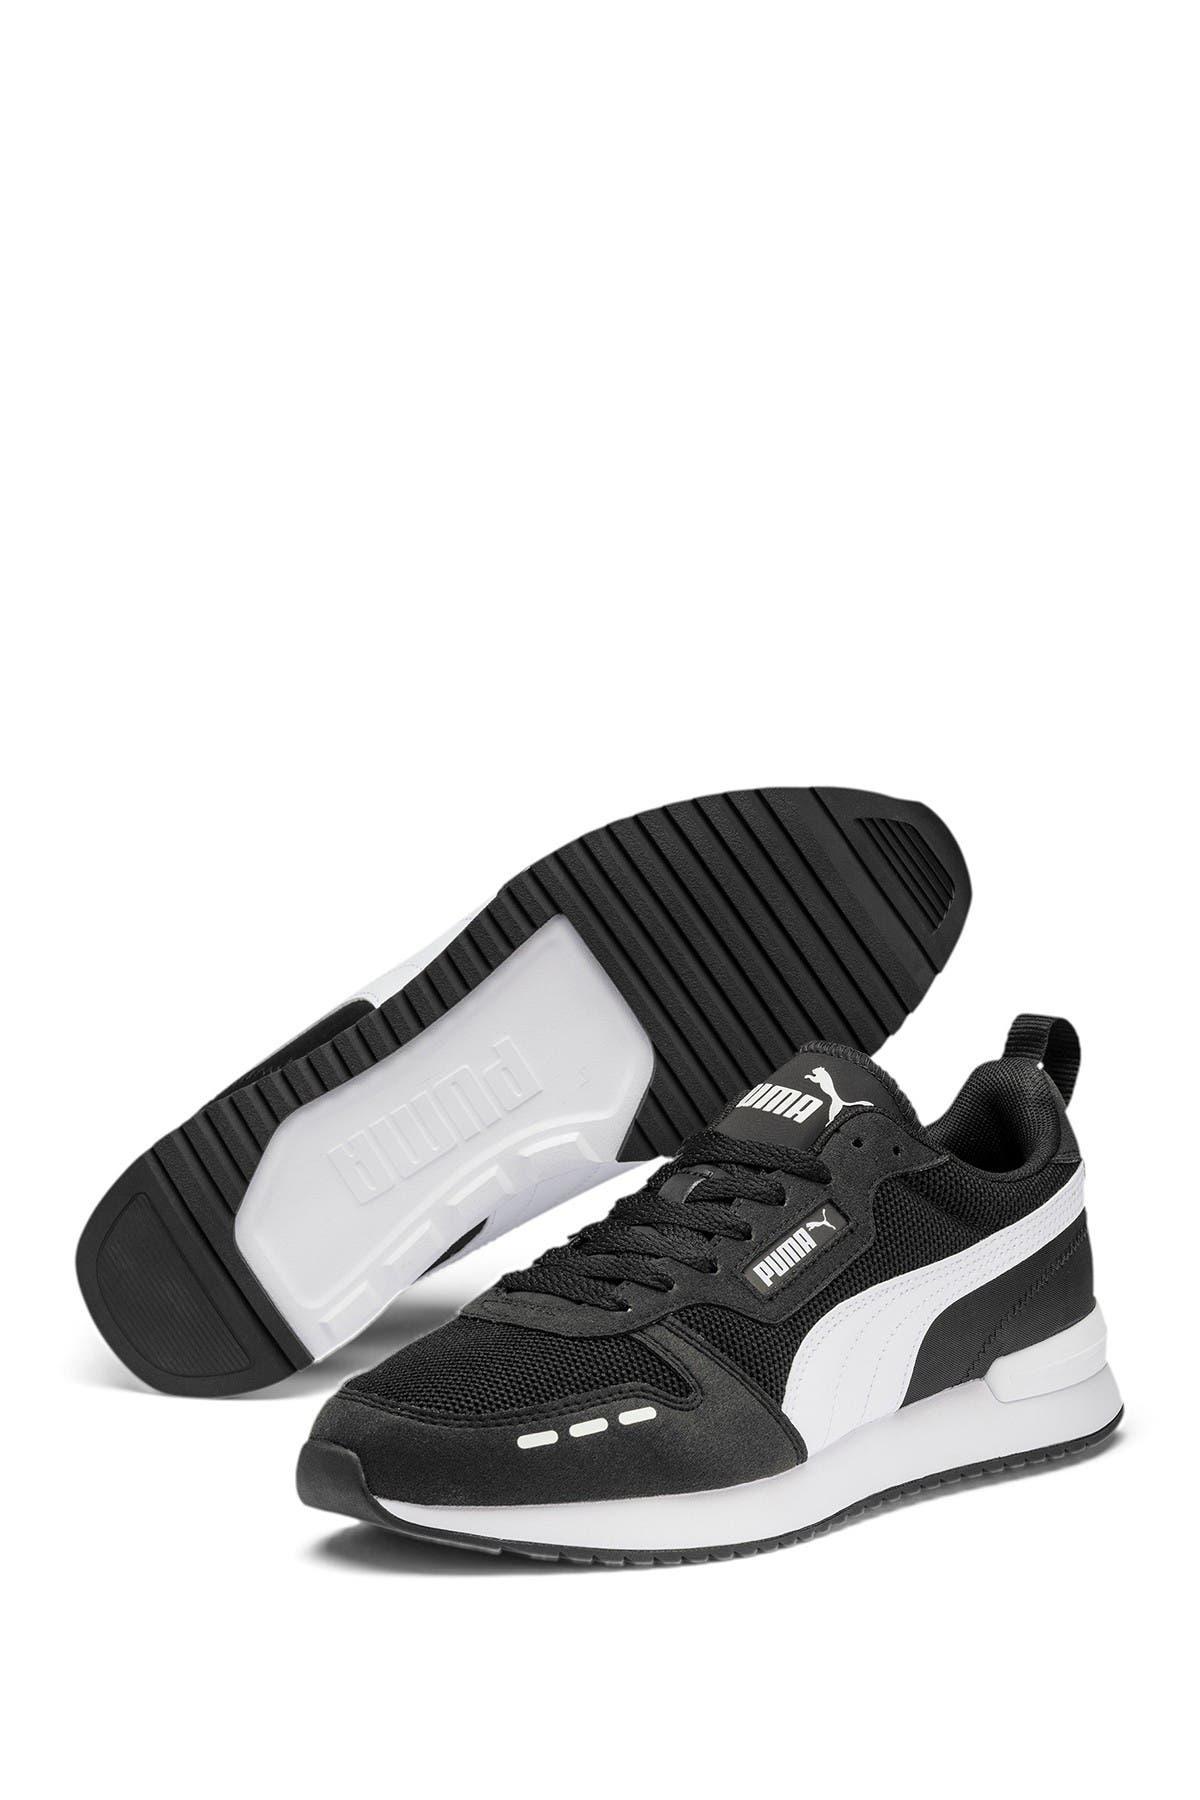 Image of PUMA R78 Sneaker